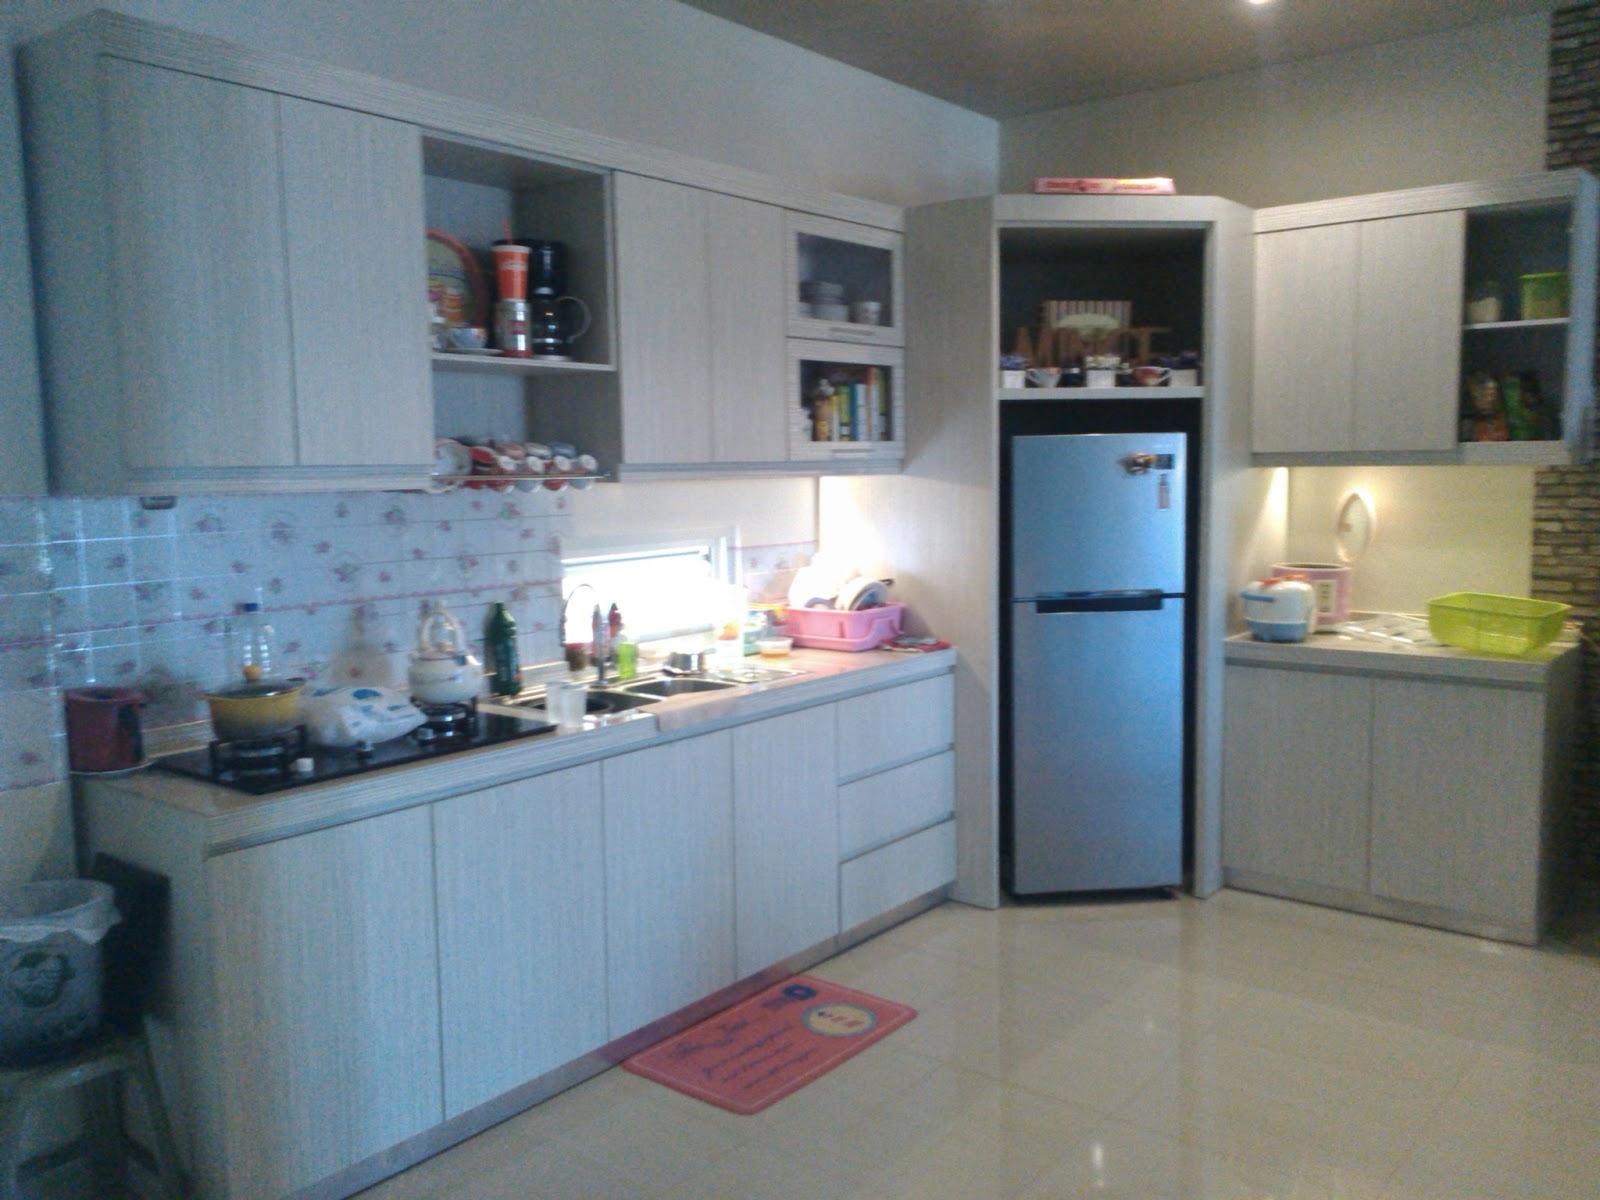 Jasa Kitchen set Murah Di Banyuwangi | Jasa Renovasi Banyuwangi